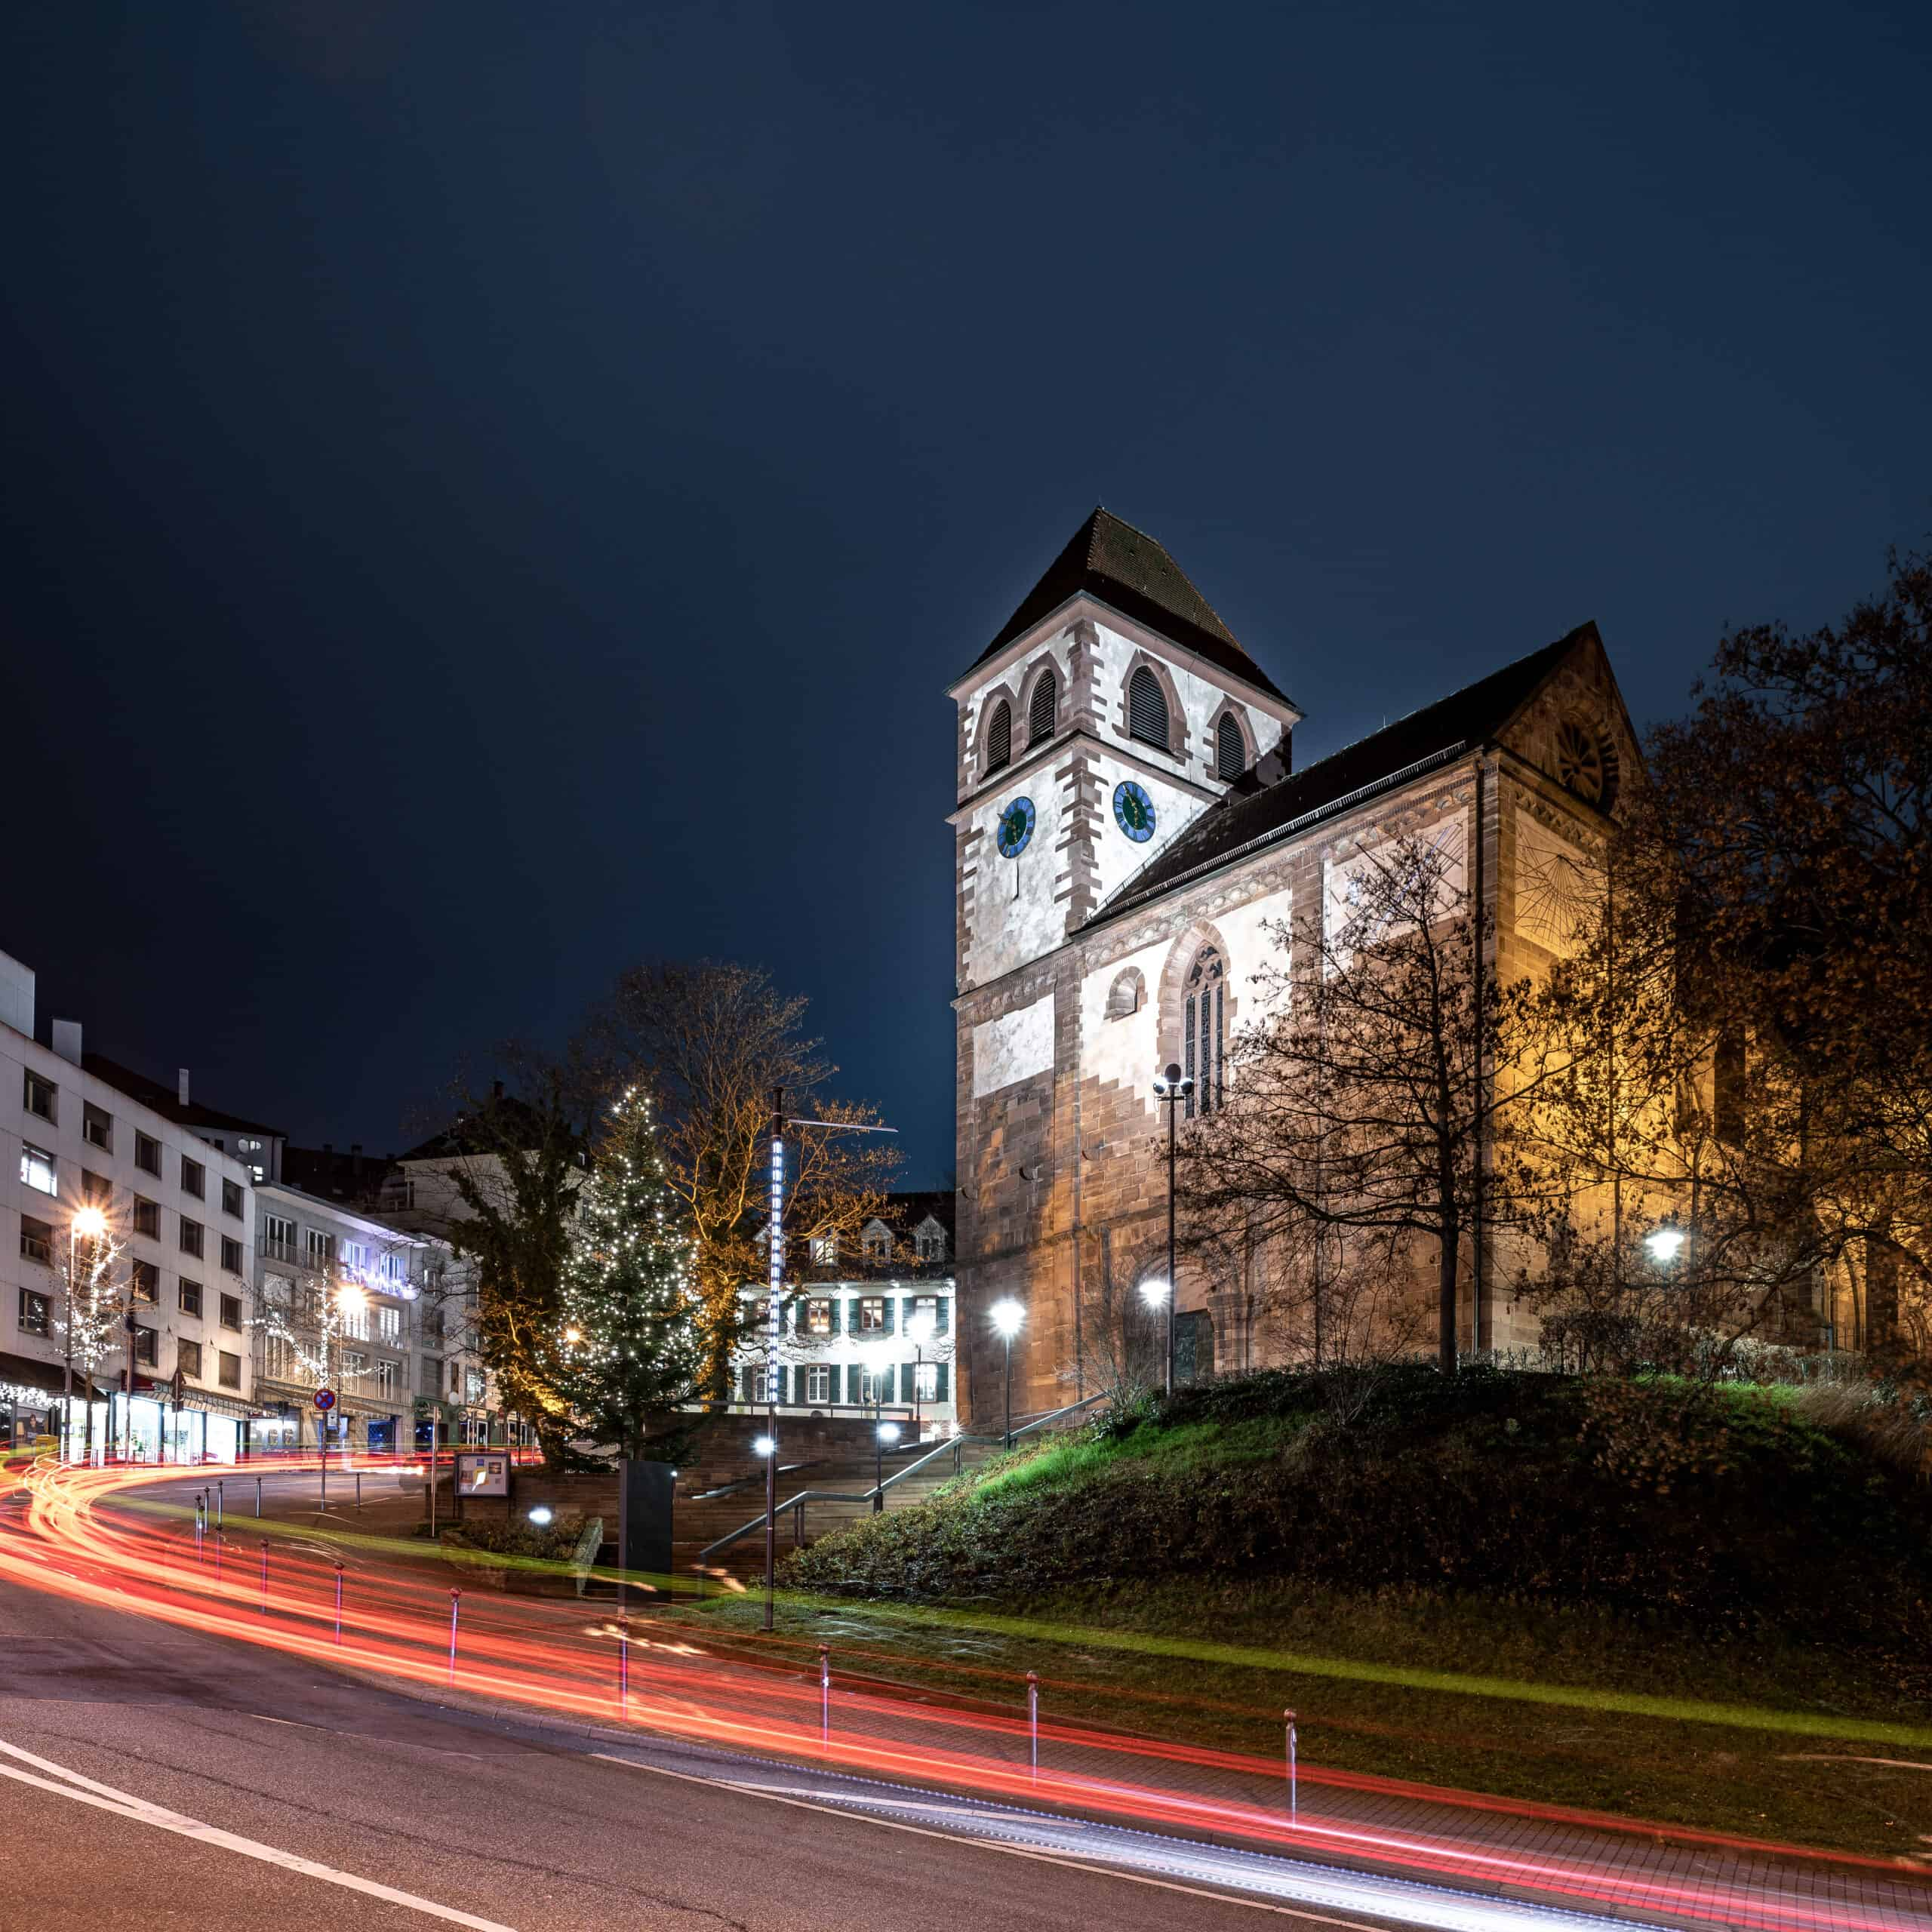 21.-SchlosskircheDSC03236-scaled